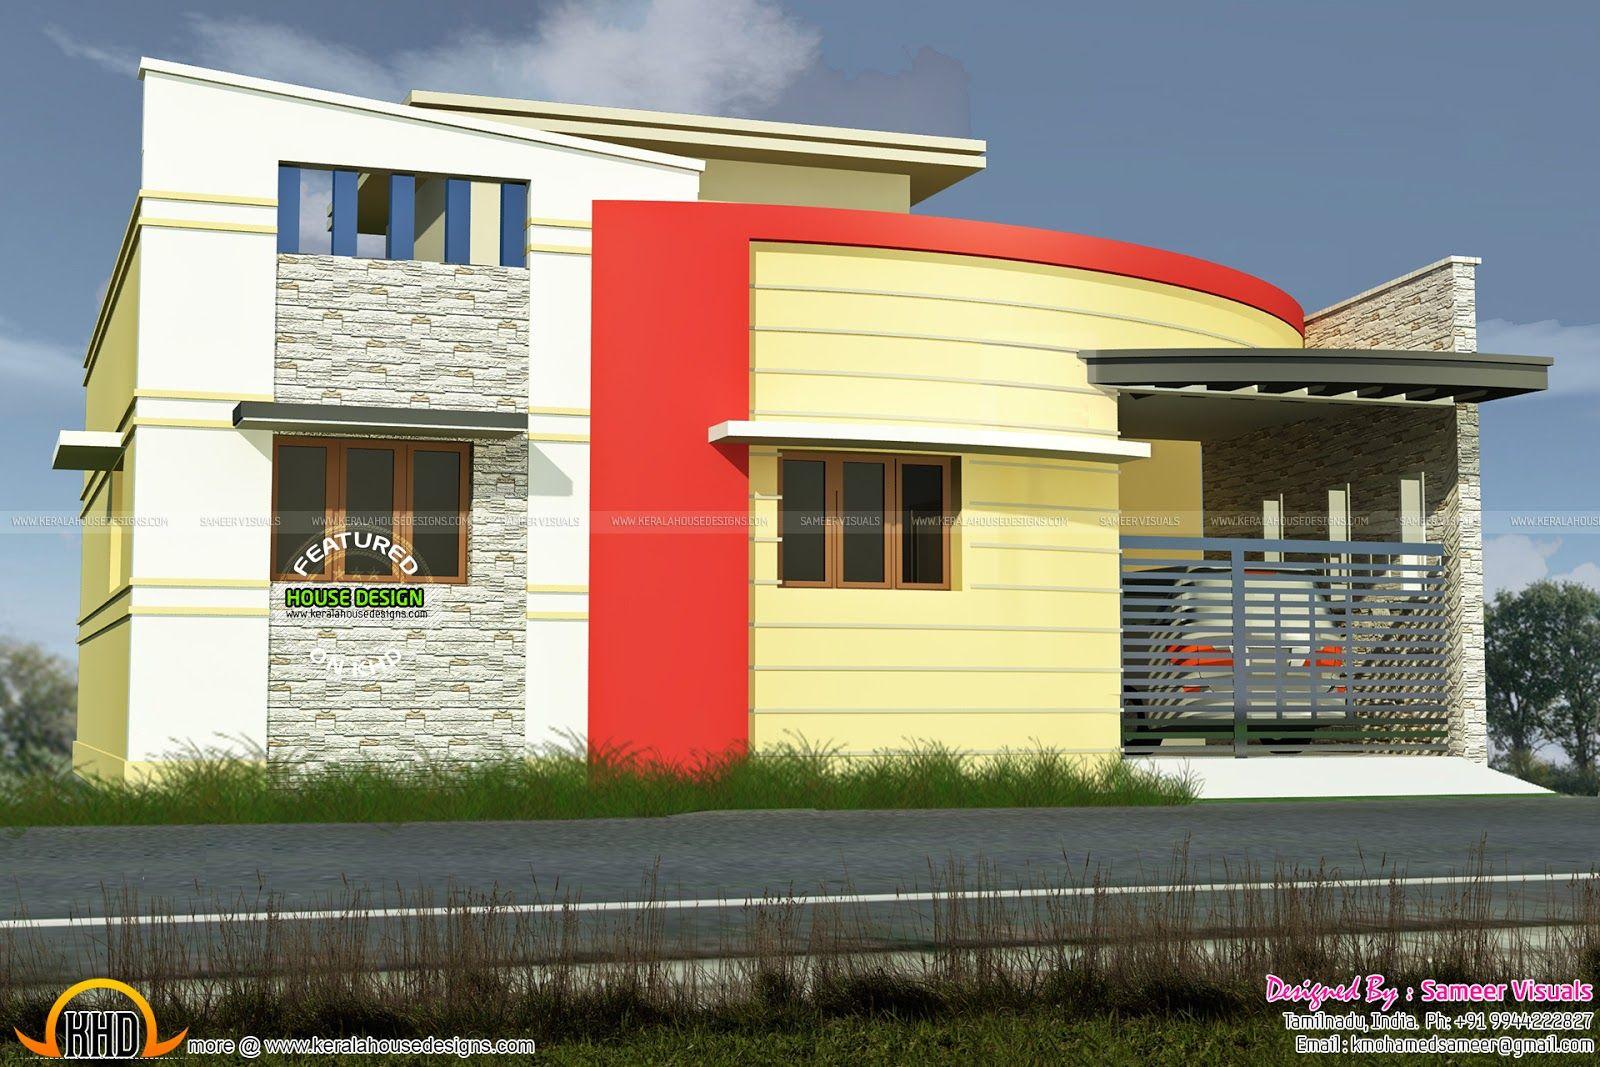 3 bedroom Tamilnadu style modern home single